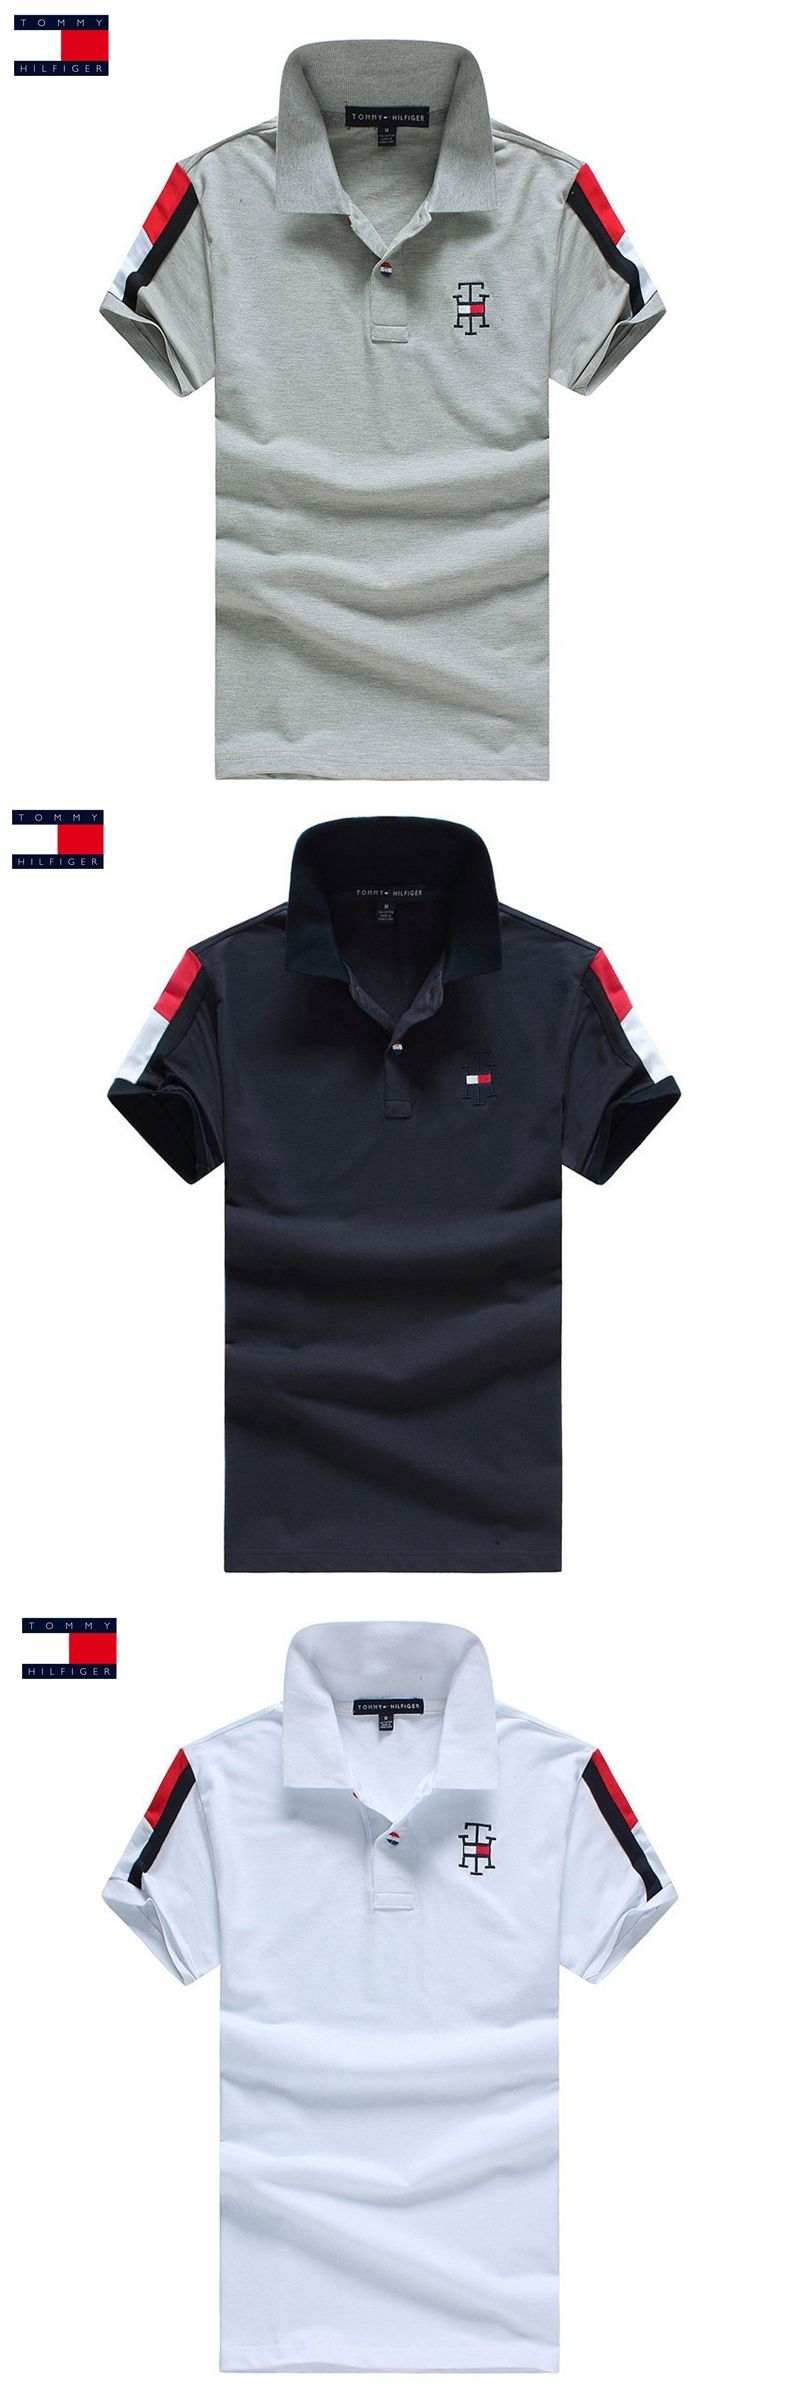 TOMMY HILFIGER Hot Sale Polo Shirts Men Spring Summer 3